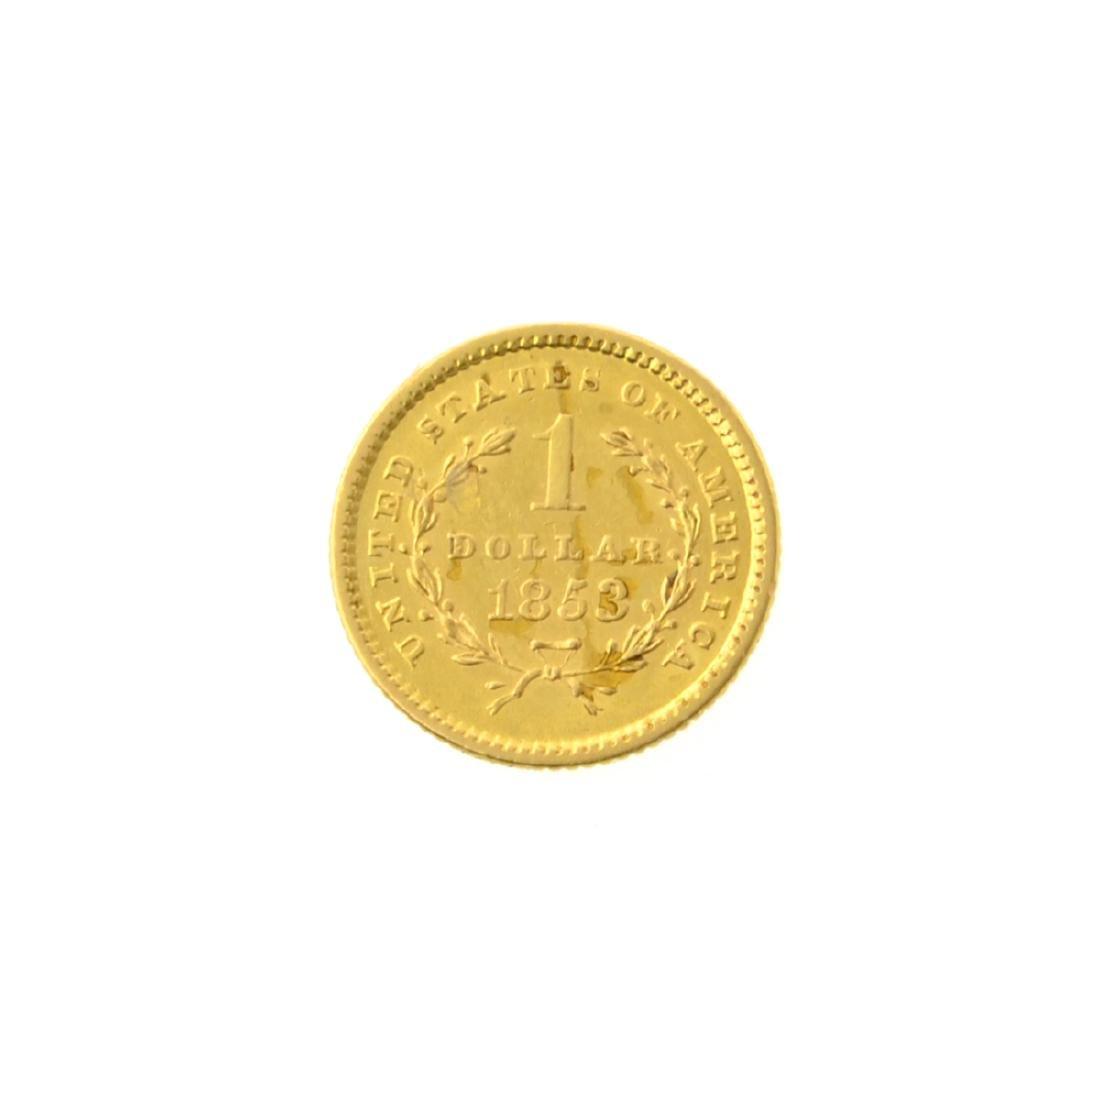 *1853 $1 U.S. Liberty Head Gold Coin (JG-MRT) - 2